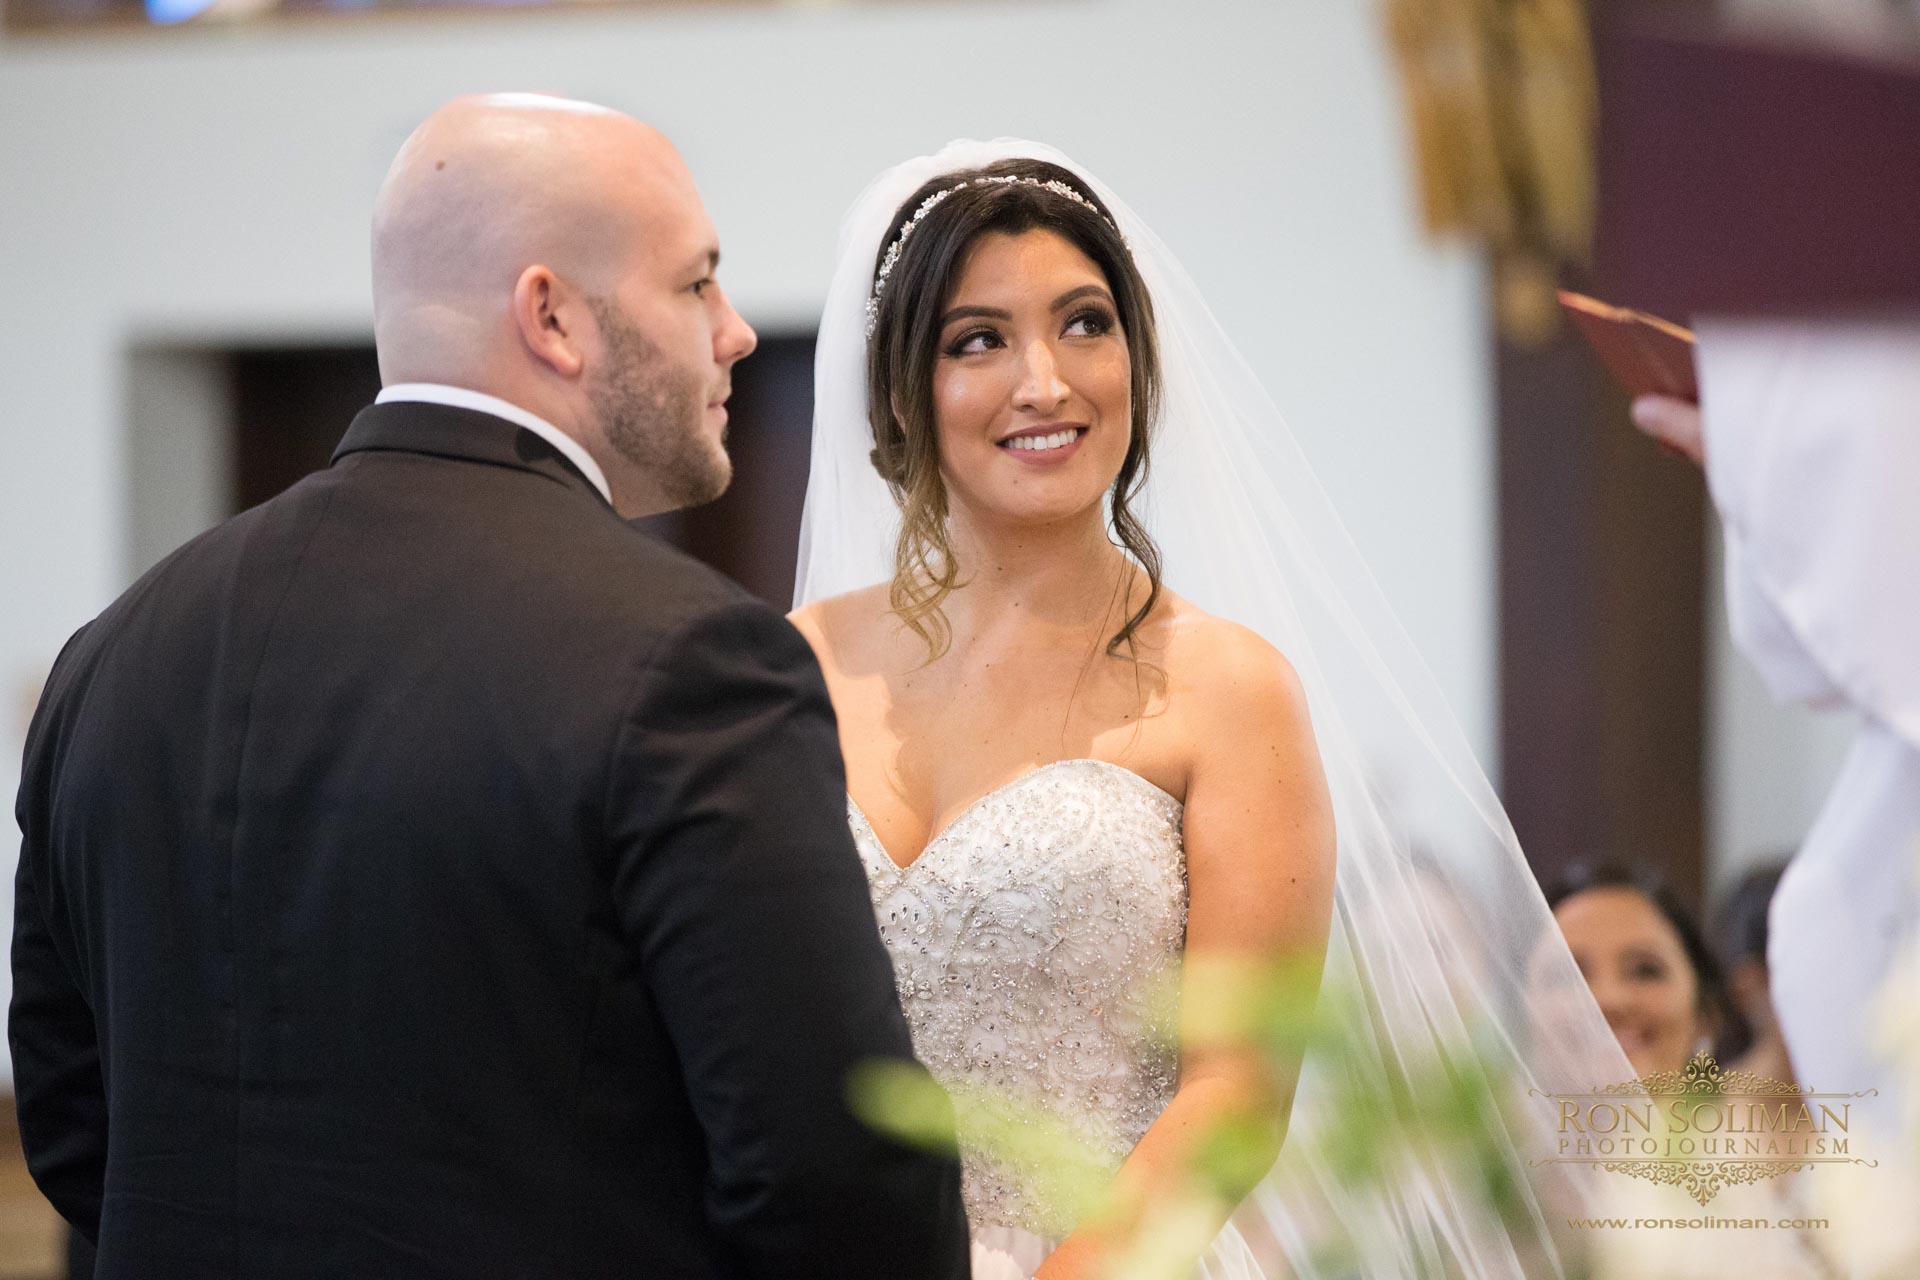 THE MERION WEDDING 15